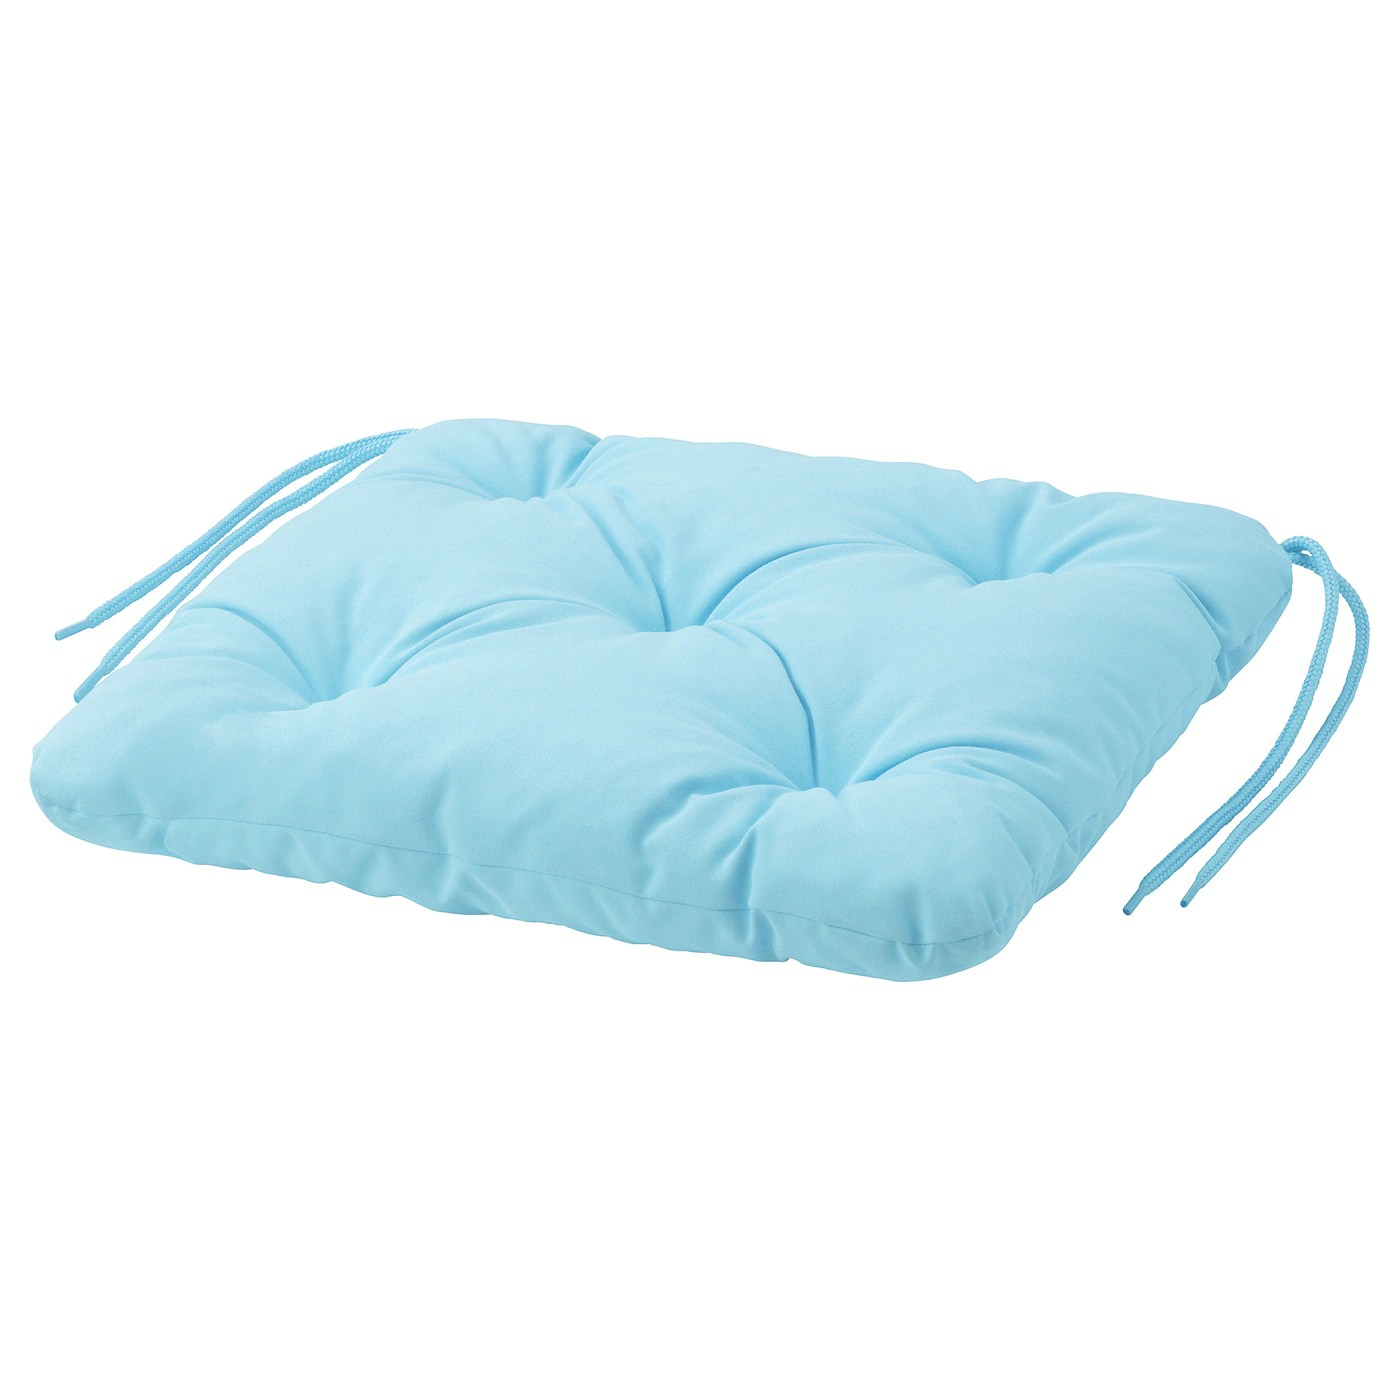 kuddarna coussin de chaise exterieur bleu clair 36x32 cm